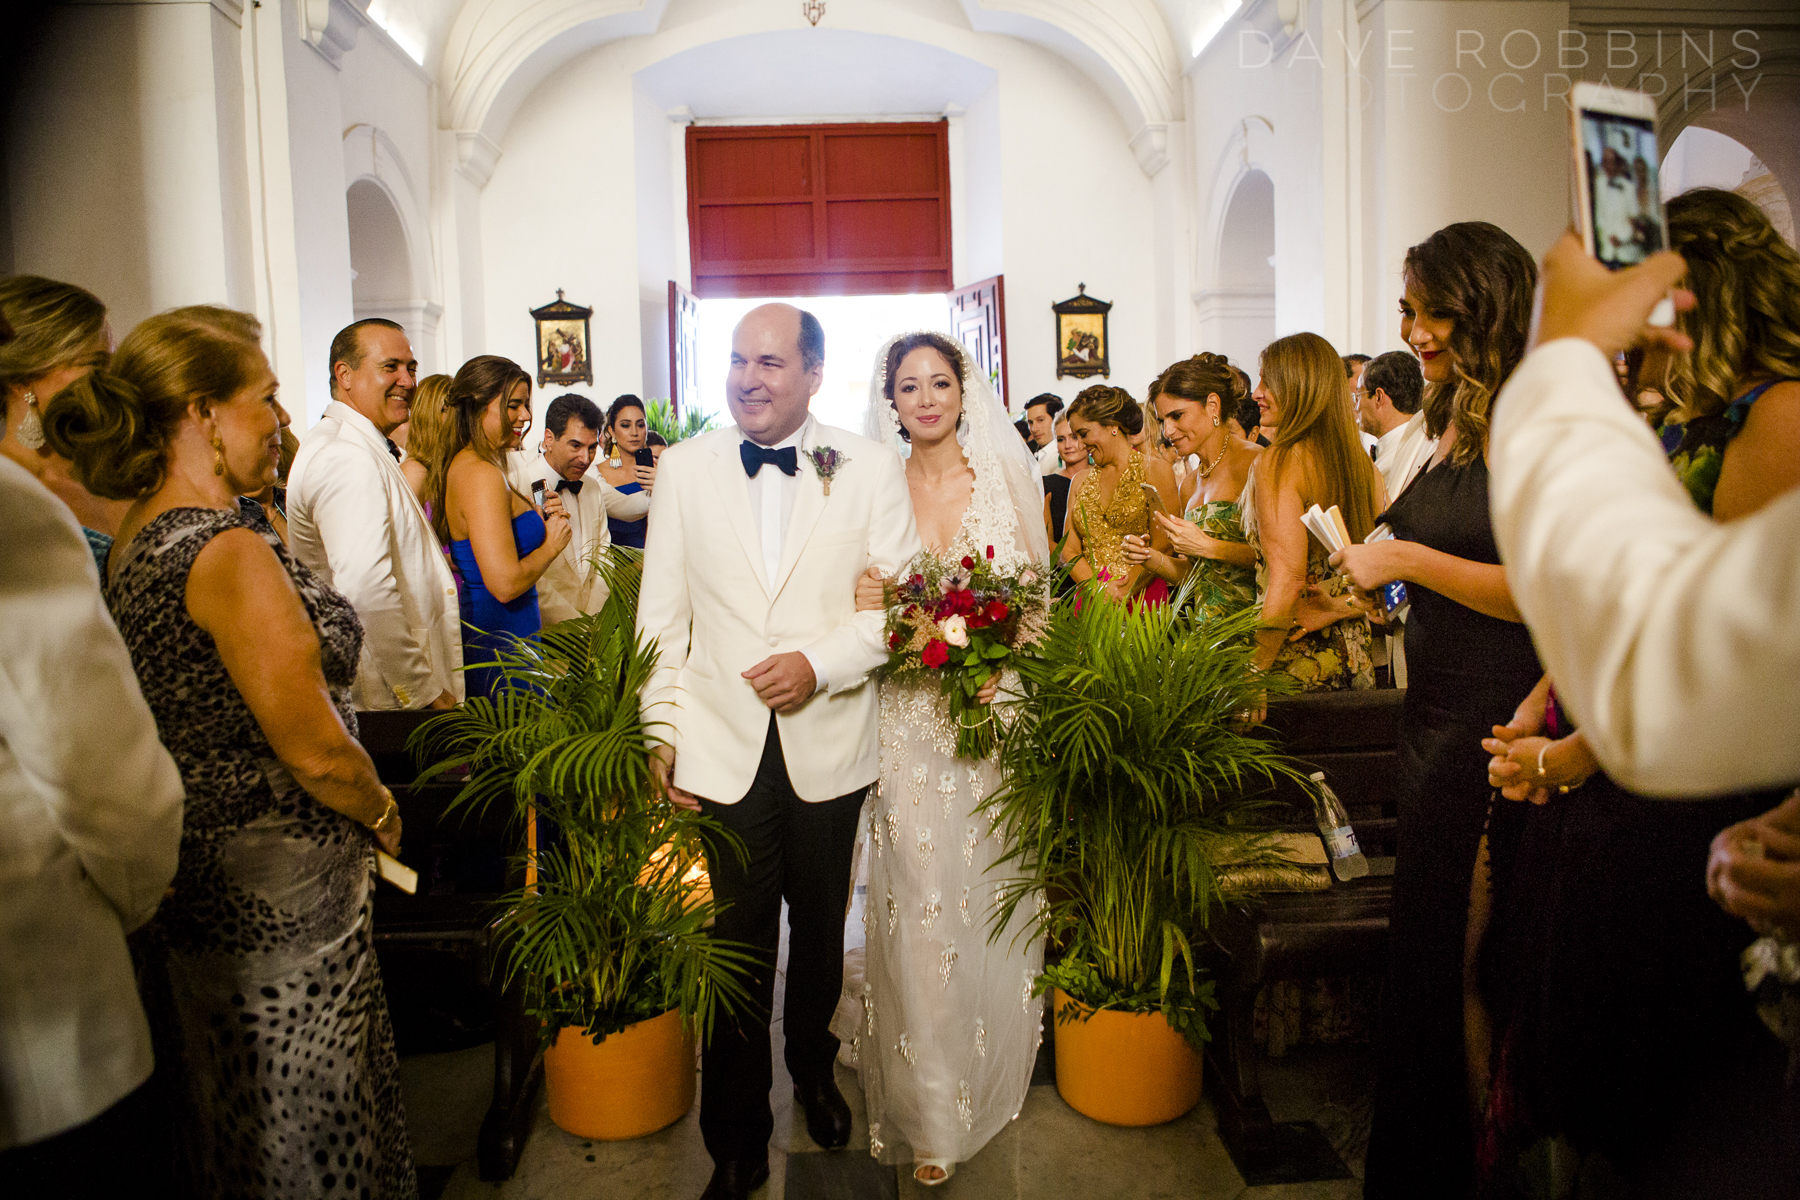 CARTAGENA WEDDING MARTHA STEWART - 0056.JPG